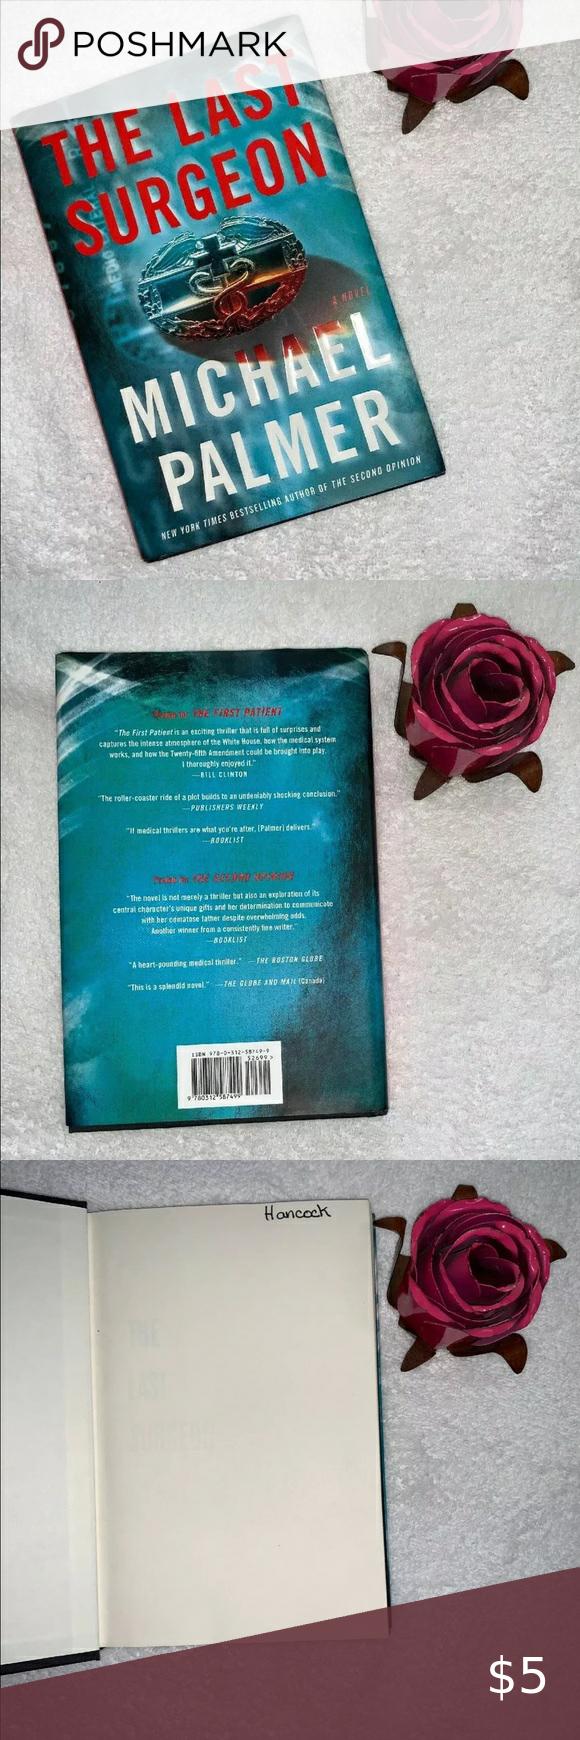 The Last Surgeon Michael Palmer 2010 Hardcover Hardcover Michael Palmer